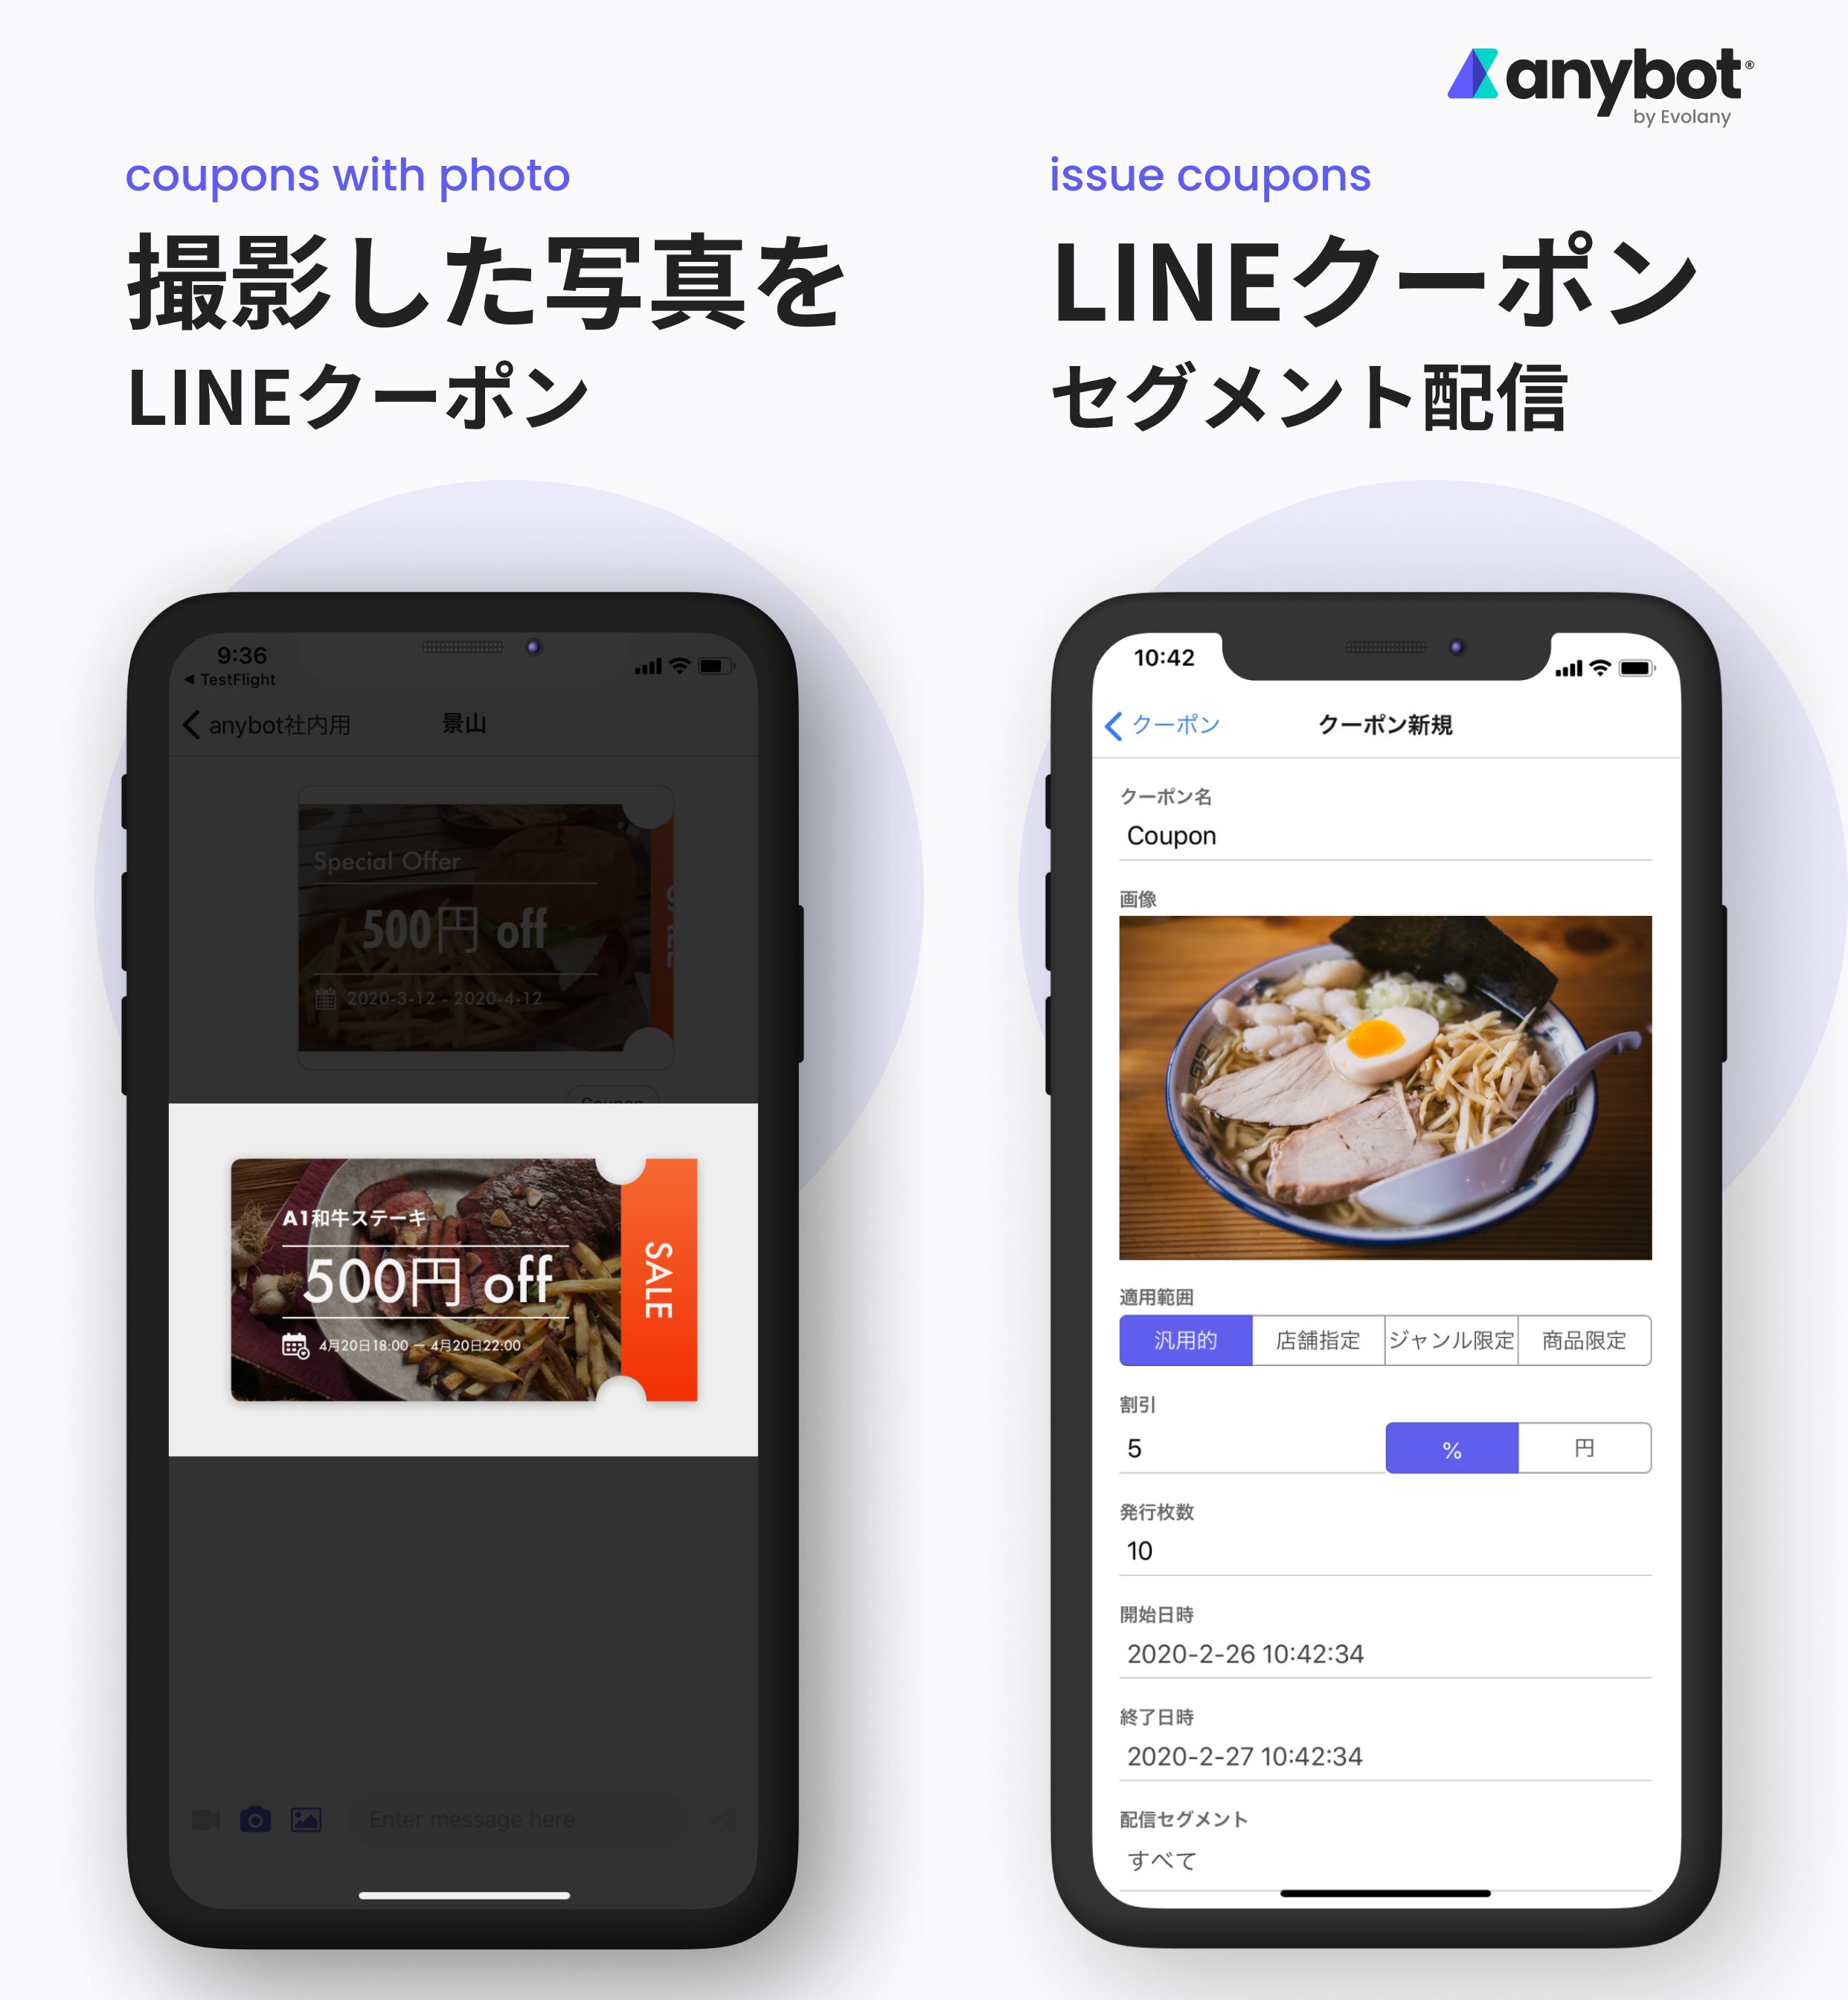 iPhone版anybot公式アプリのリリース4